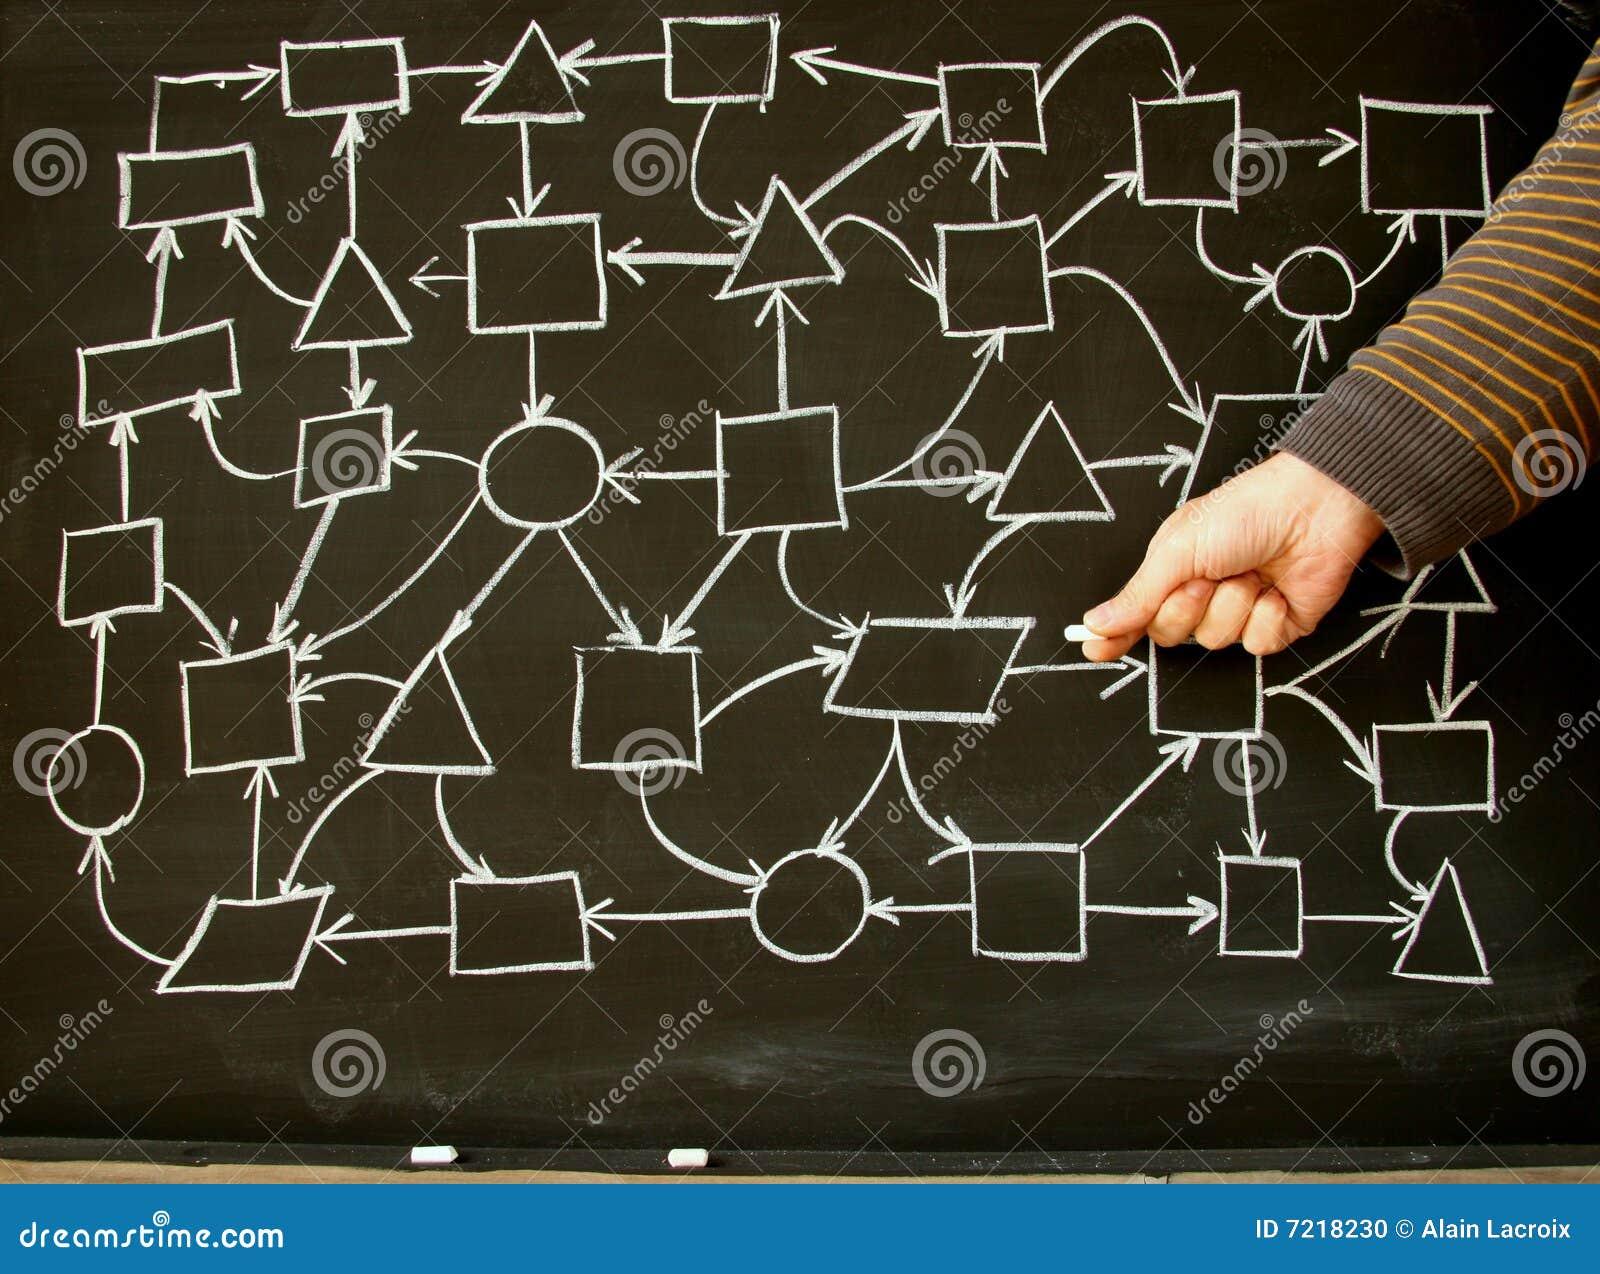 Network training